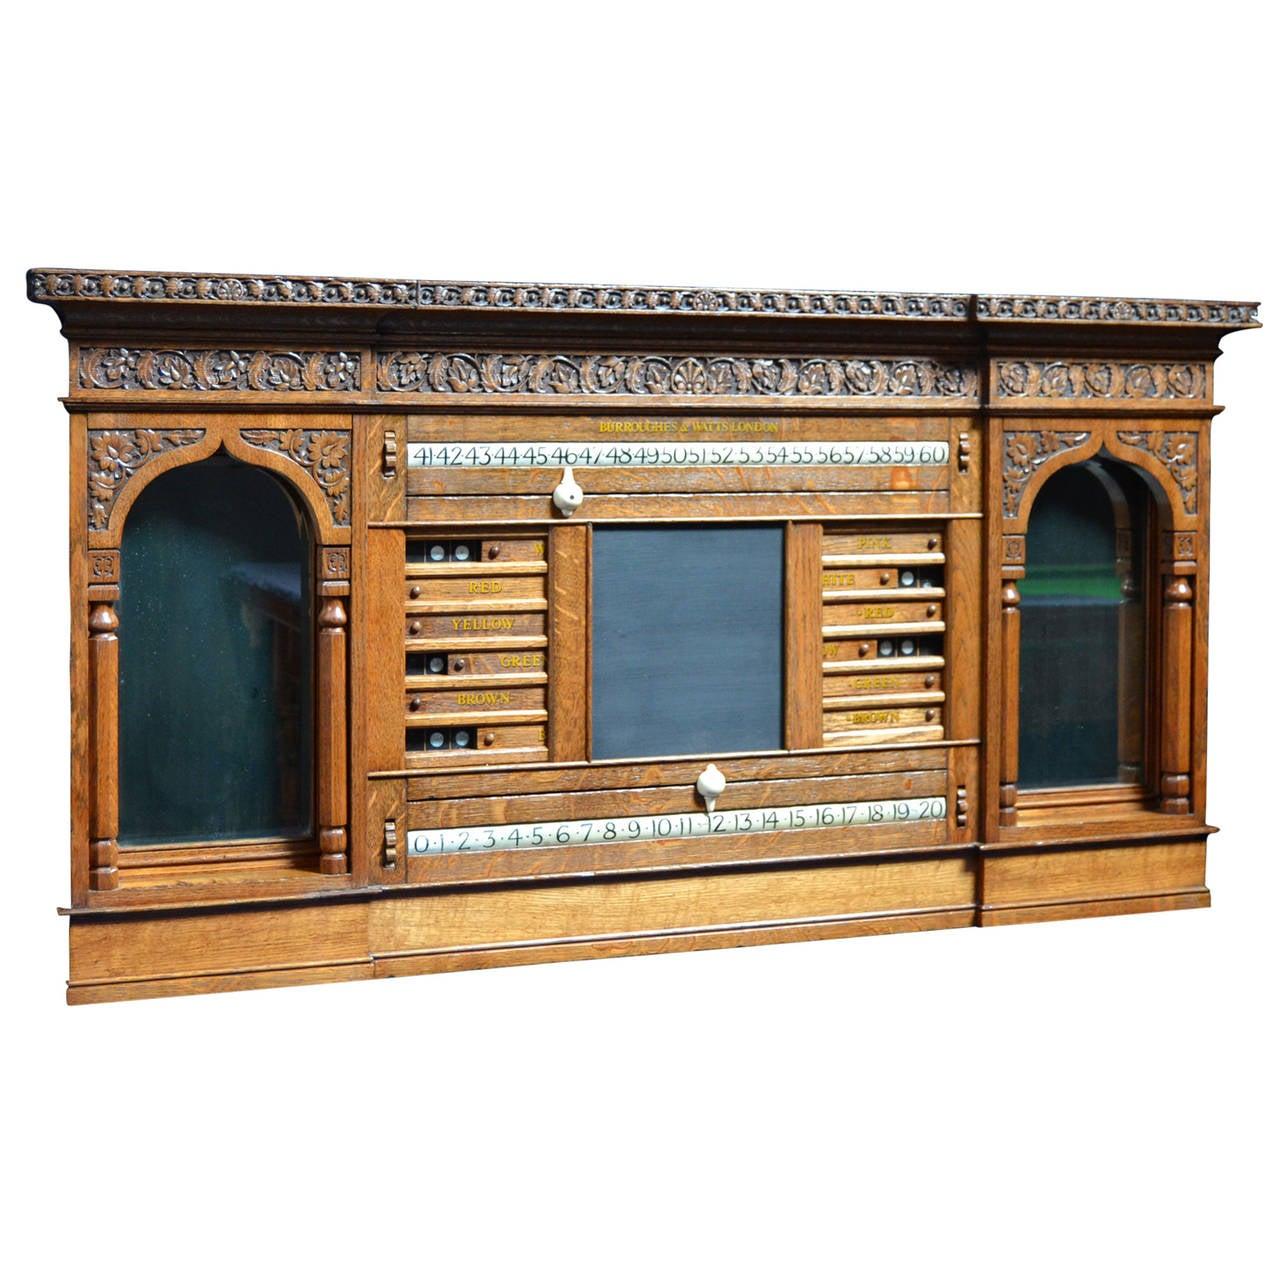 Decorative Billiard, Snooker, Pool Scoring Cabinet of Gothic Form